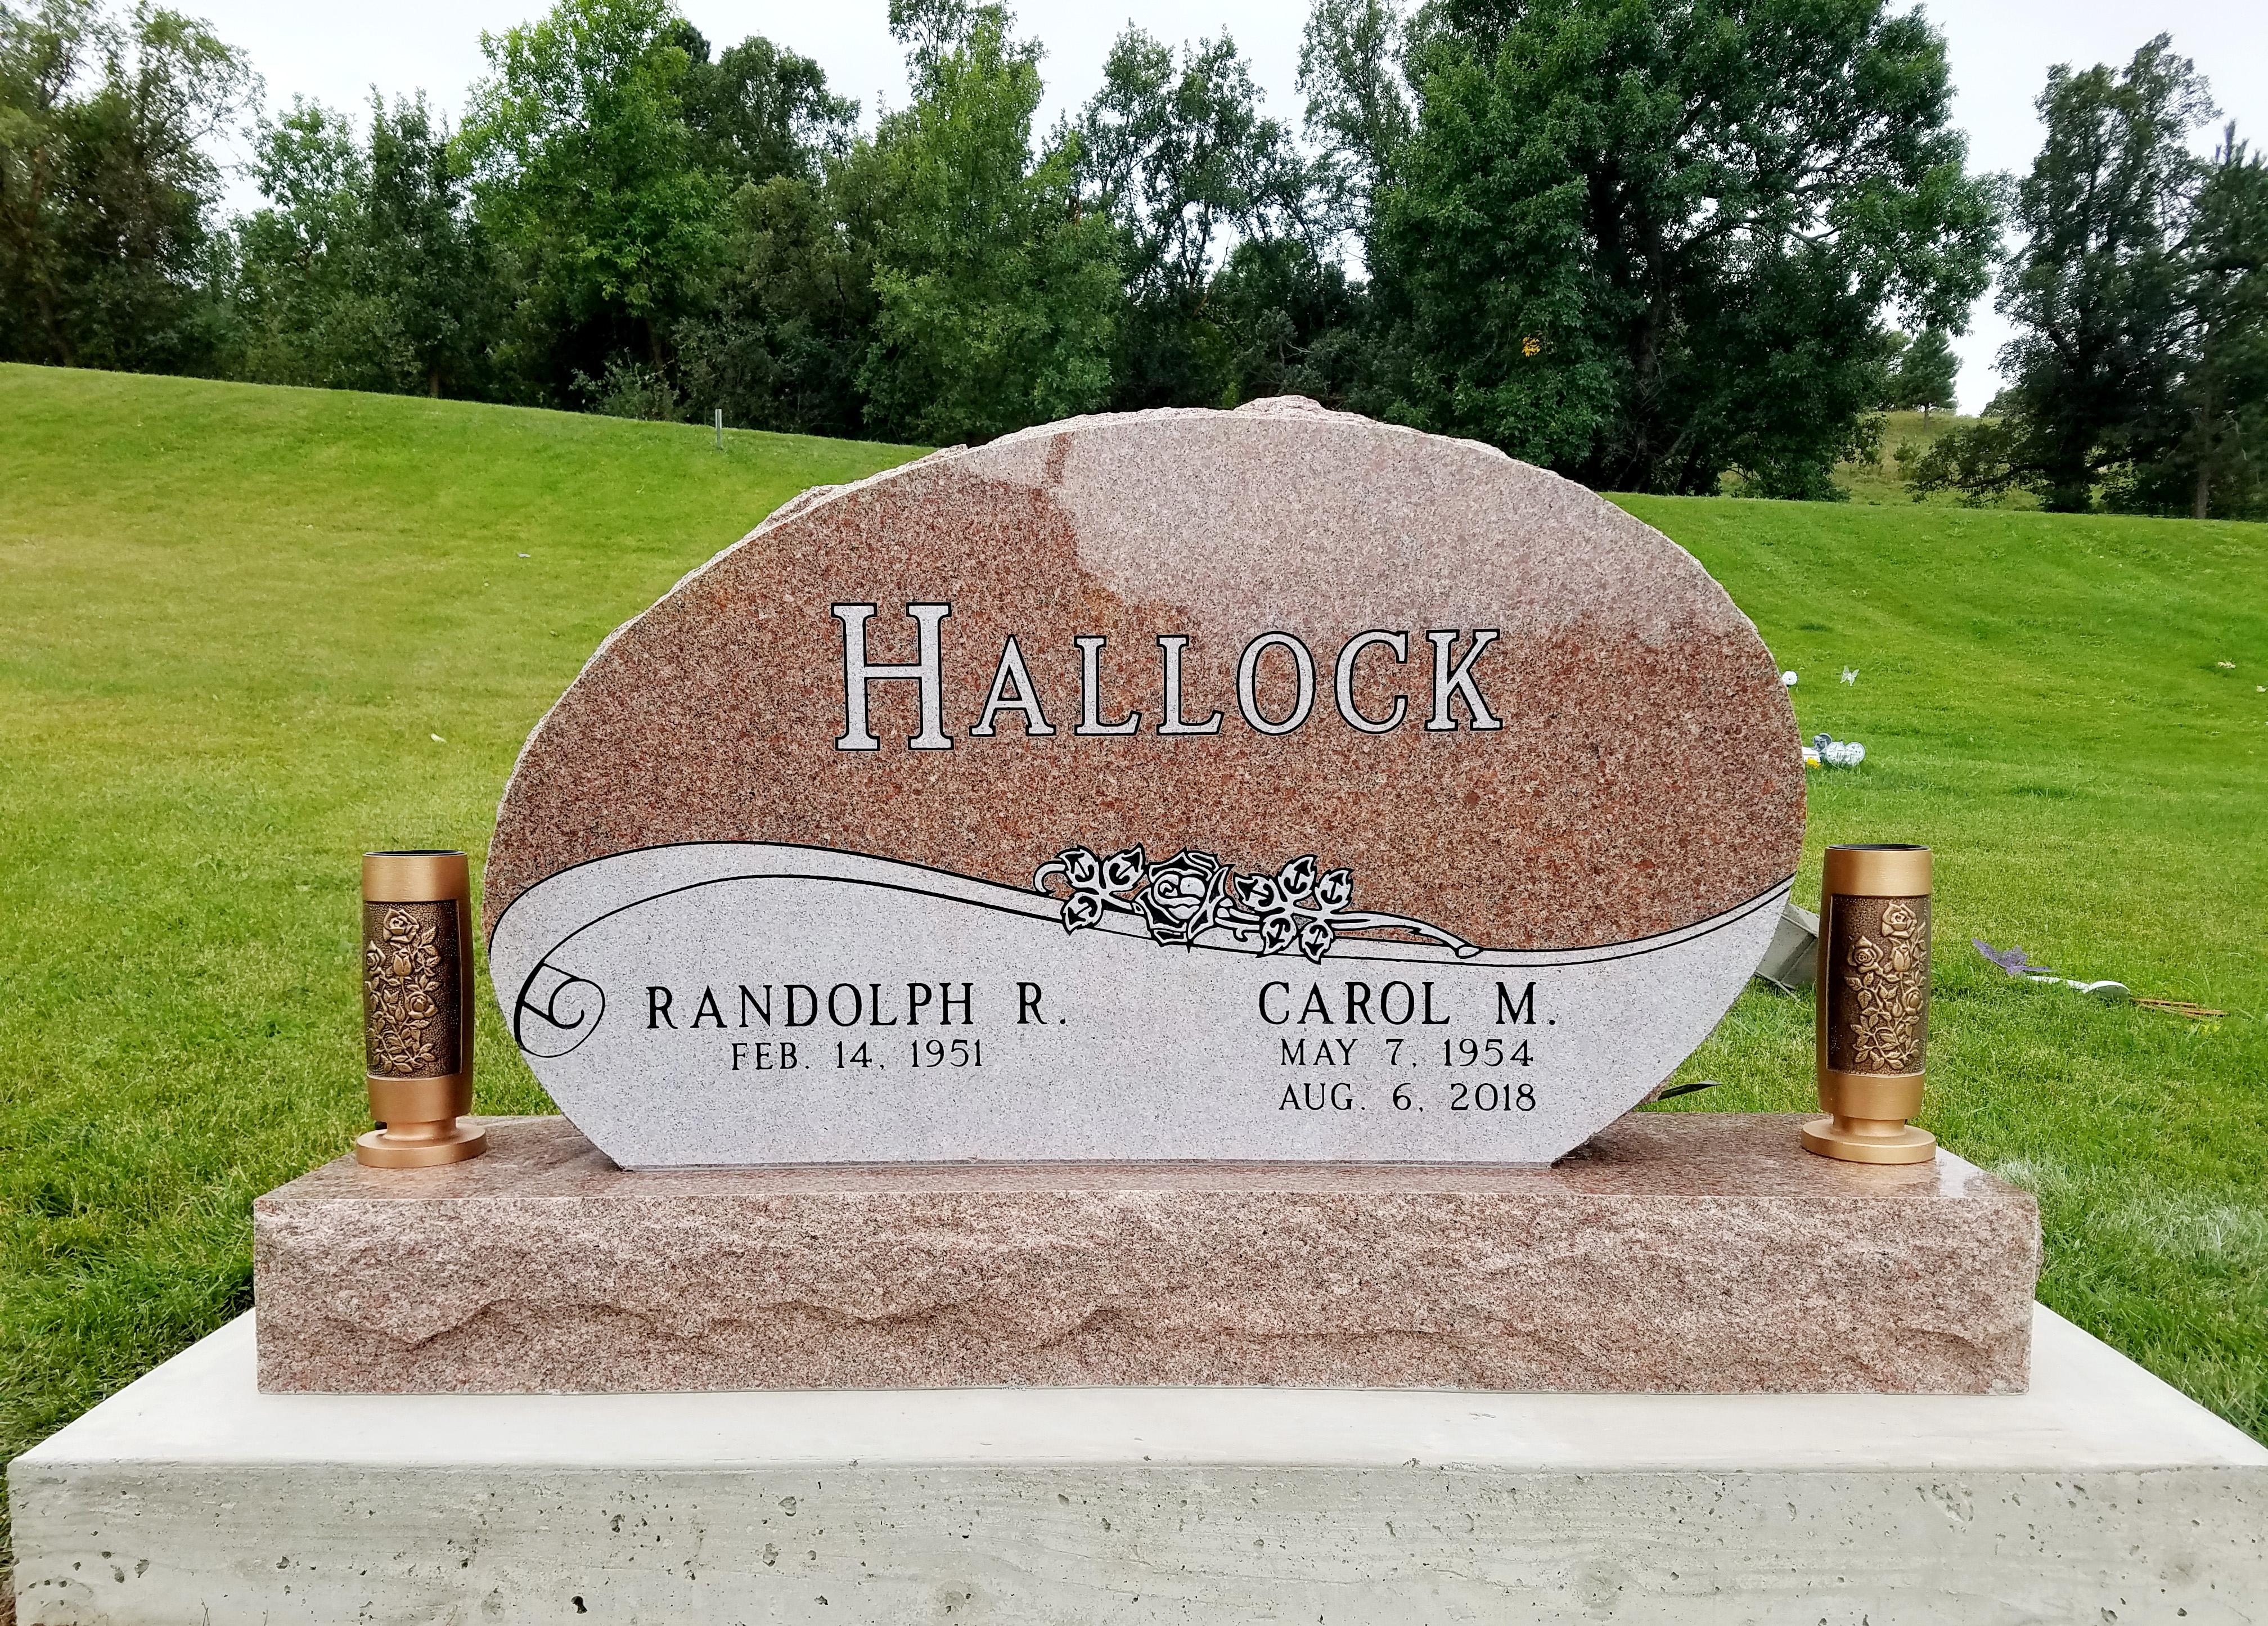 HallockB